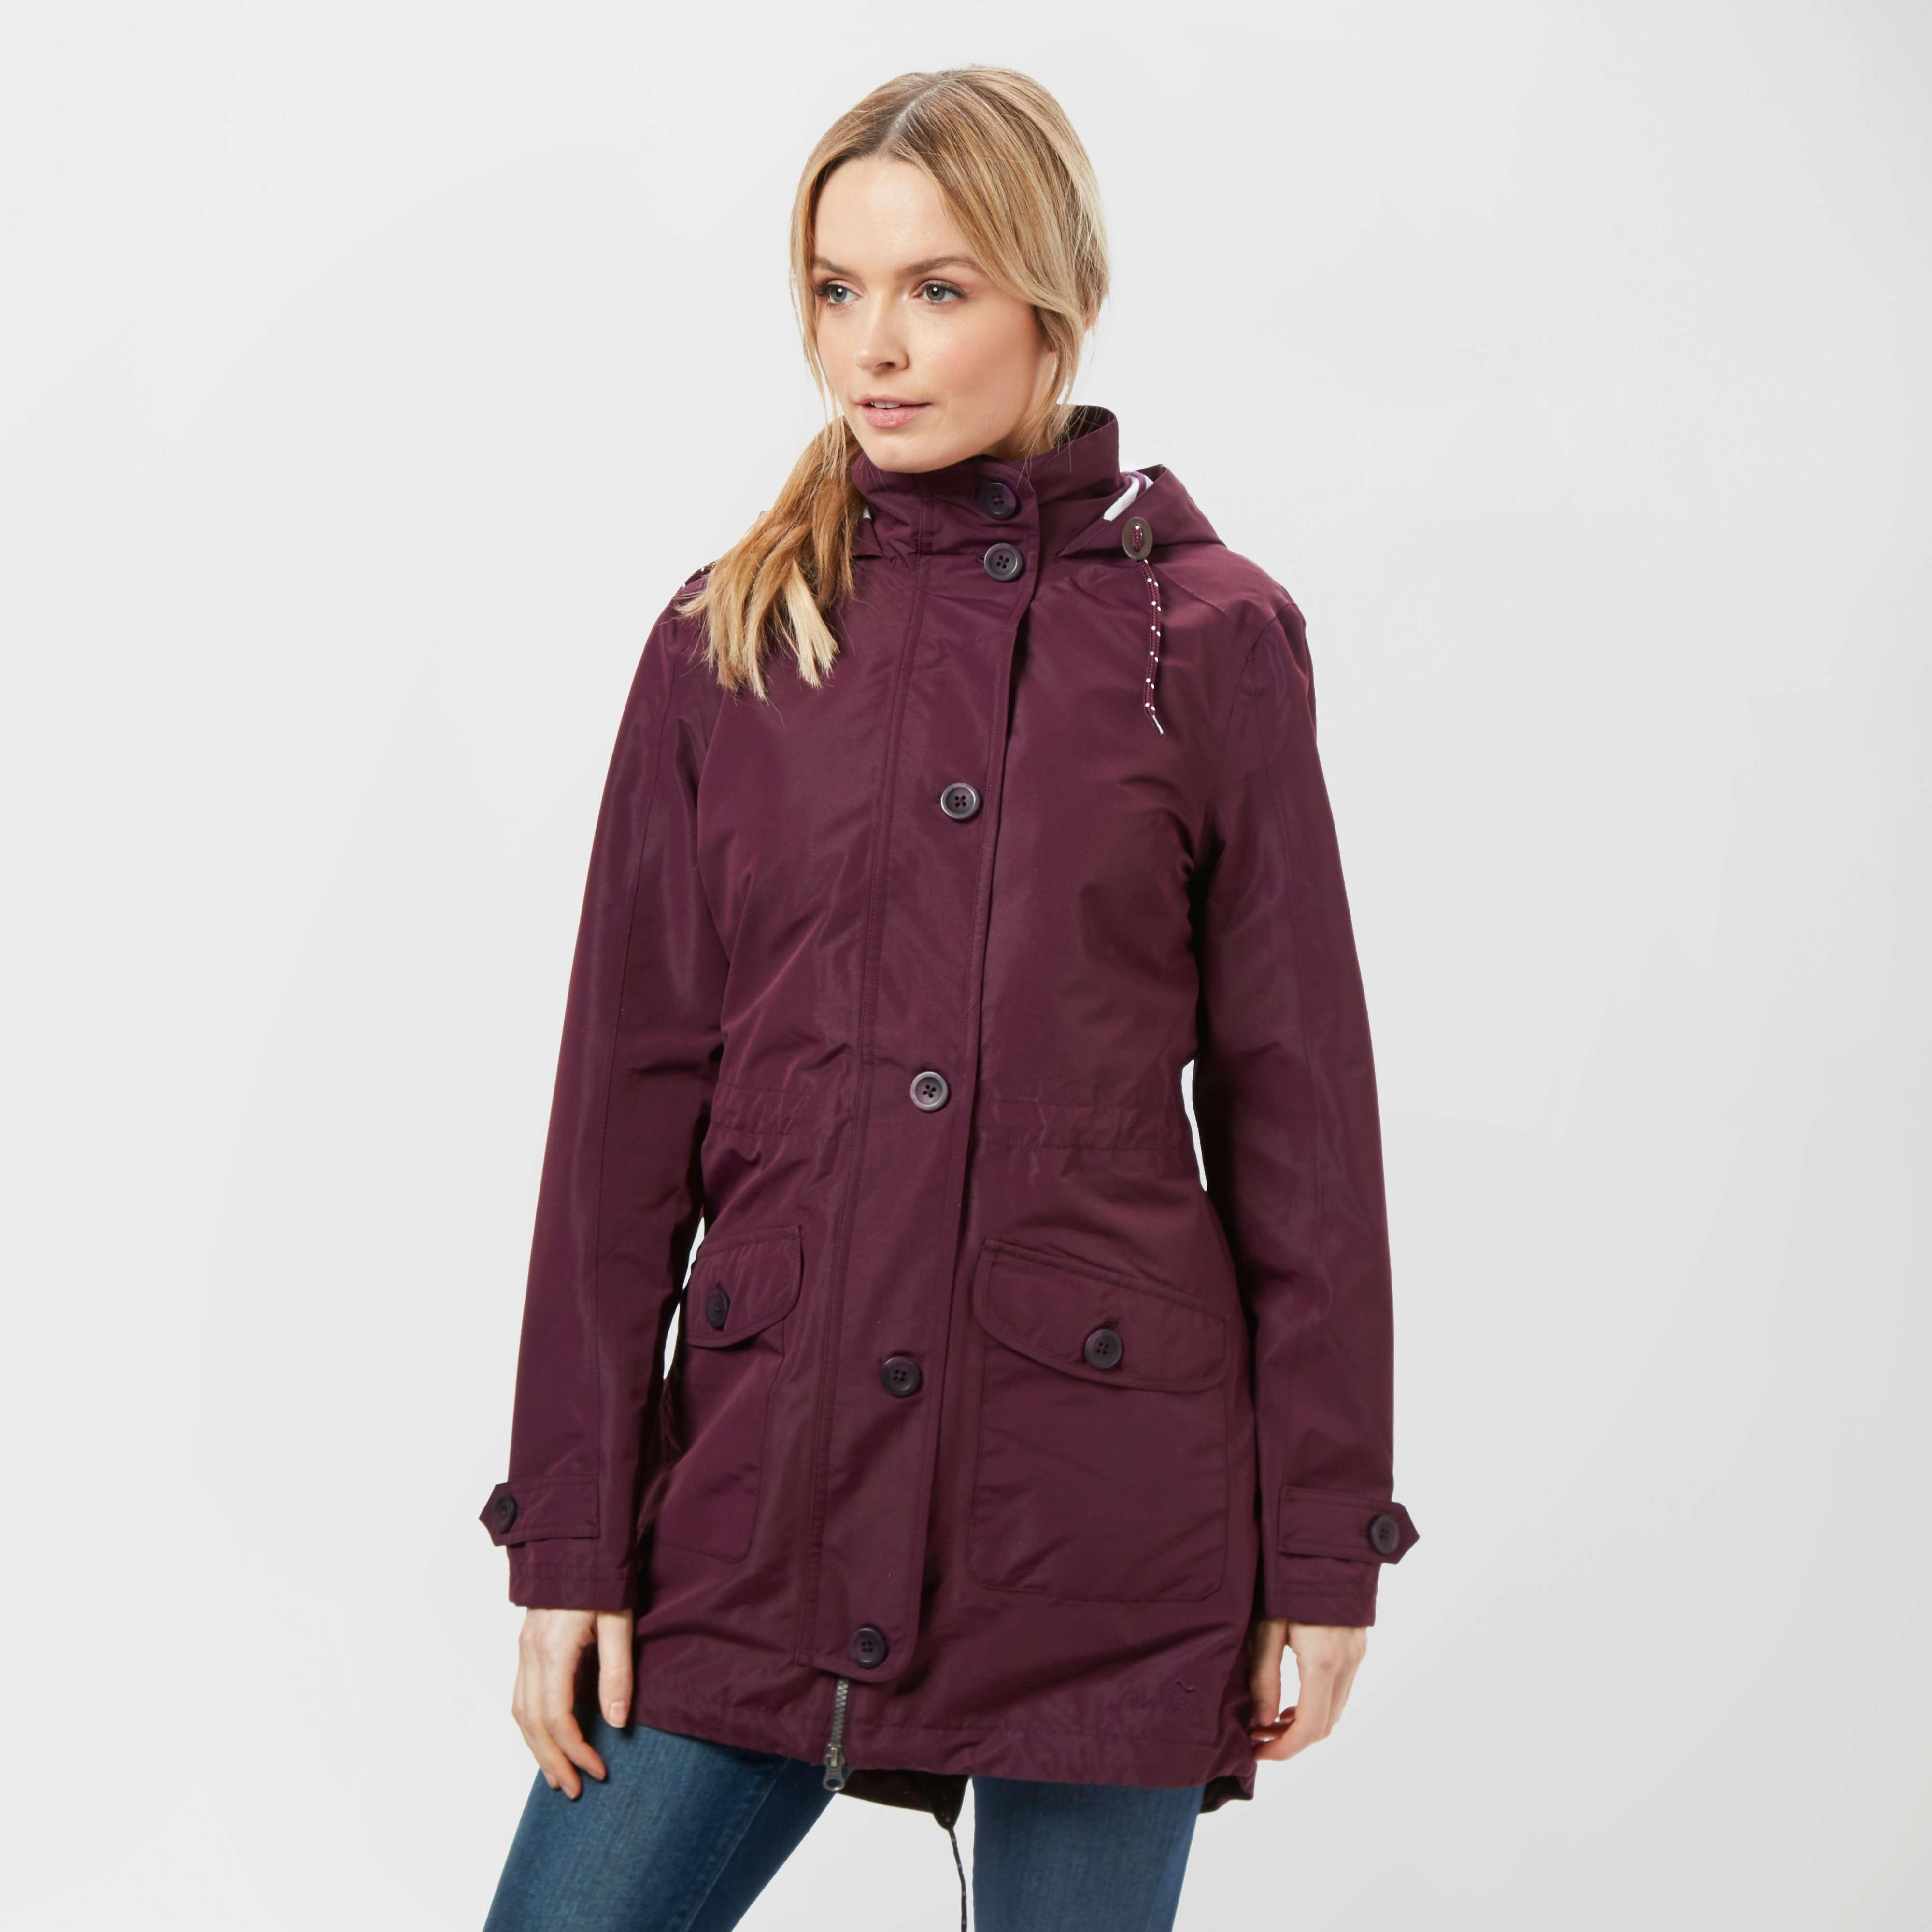 PETER STORM Women's Oakwood Jacket